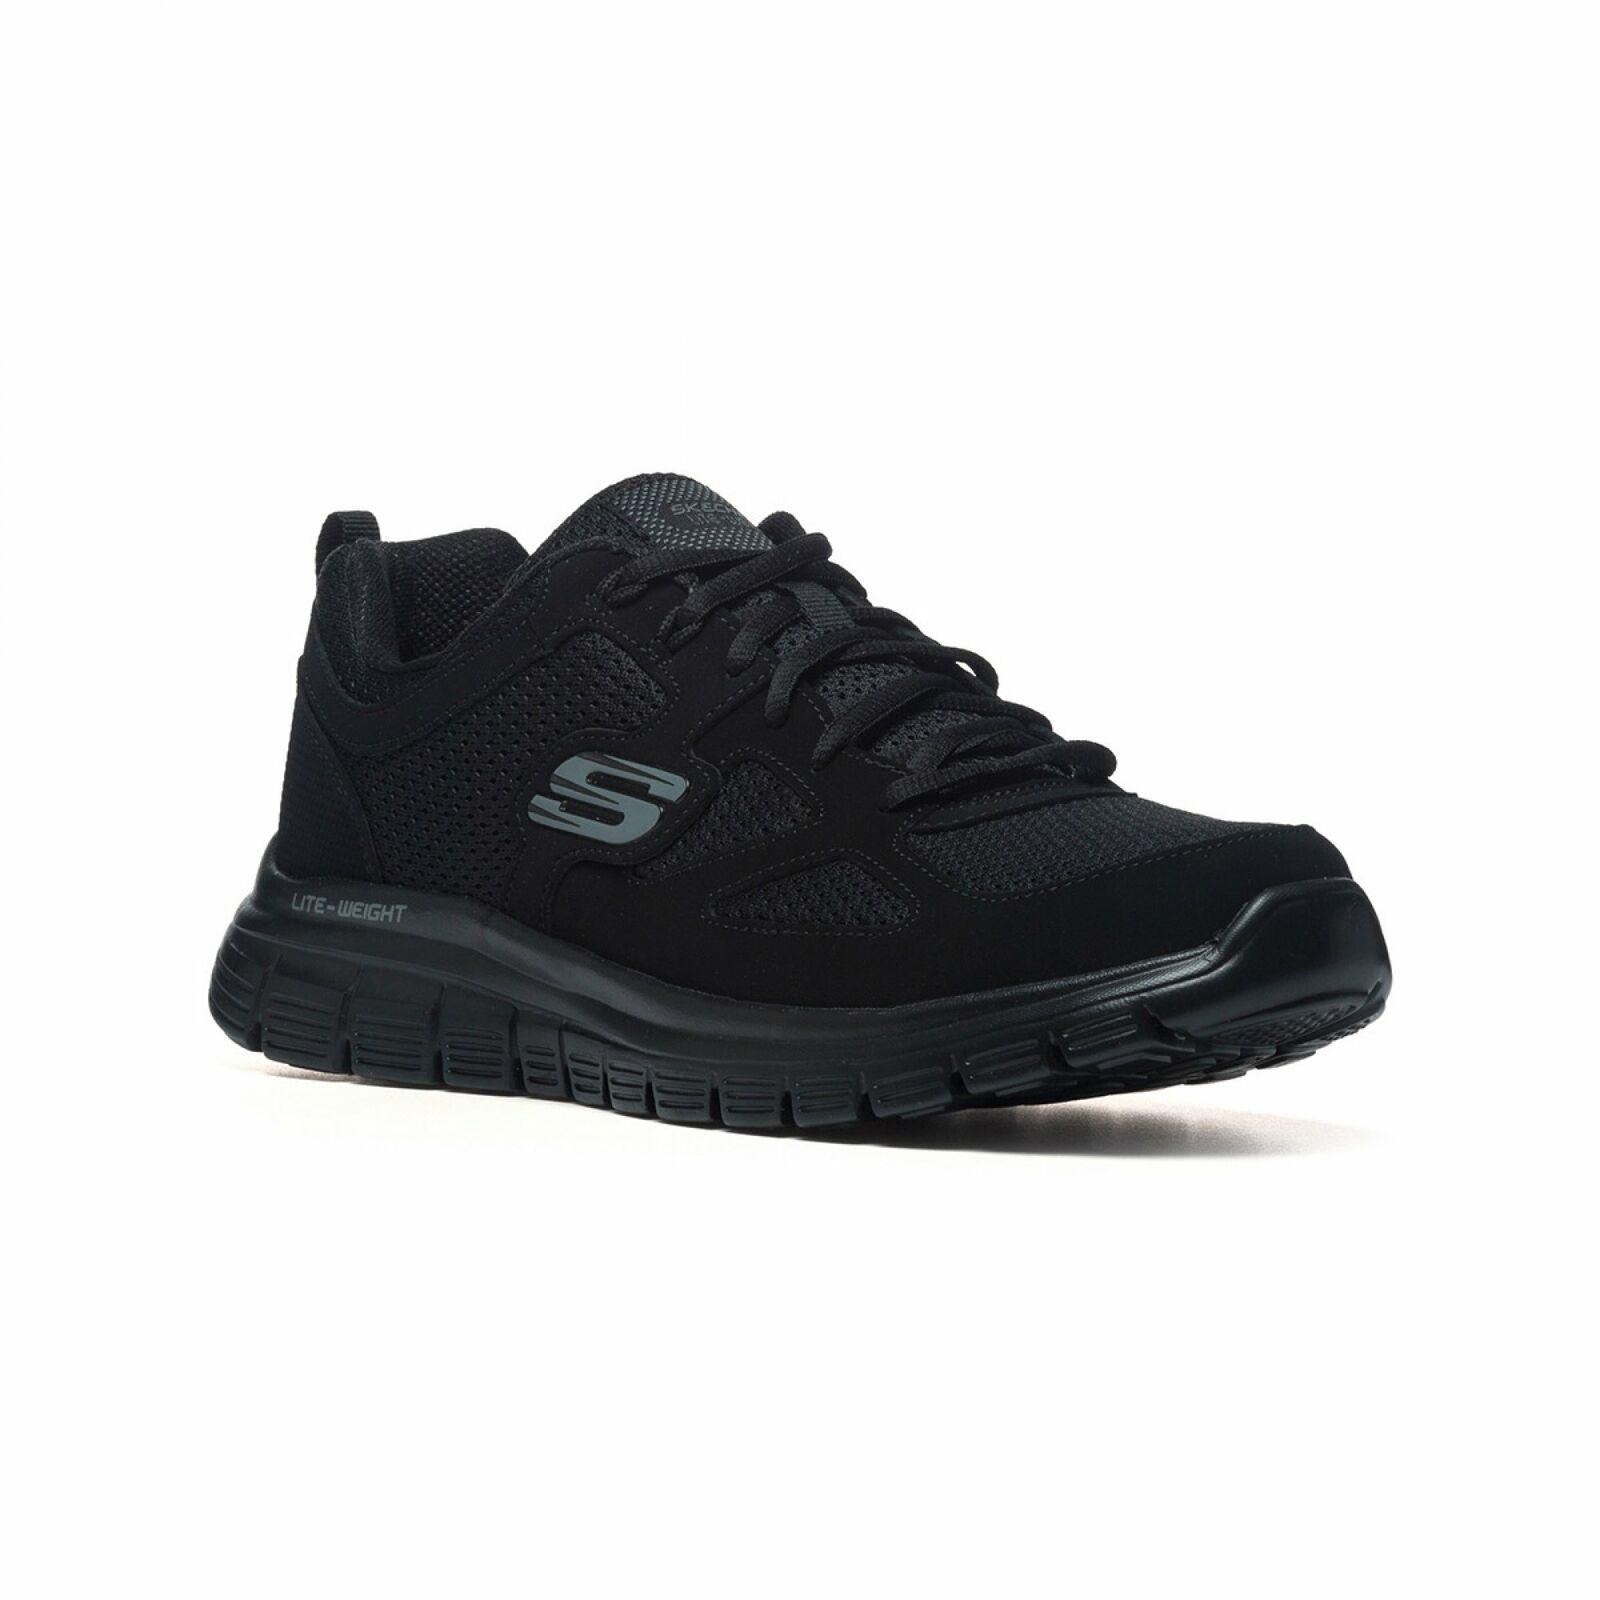 Skechers Burns Agoura trainers Memory Foam Blu o Nero Sneakers Uomo